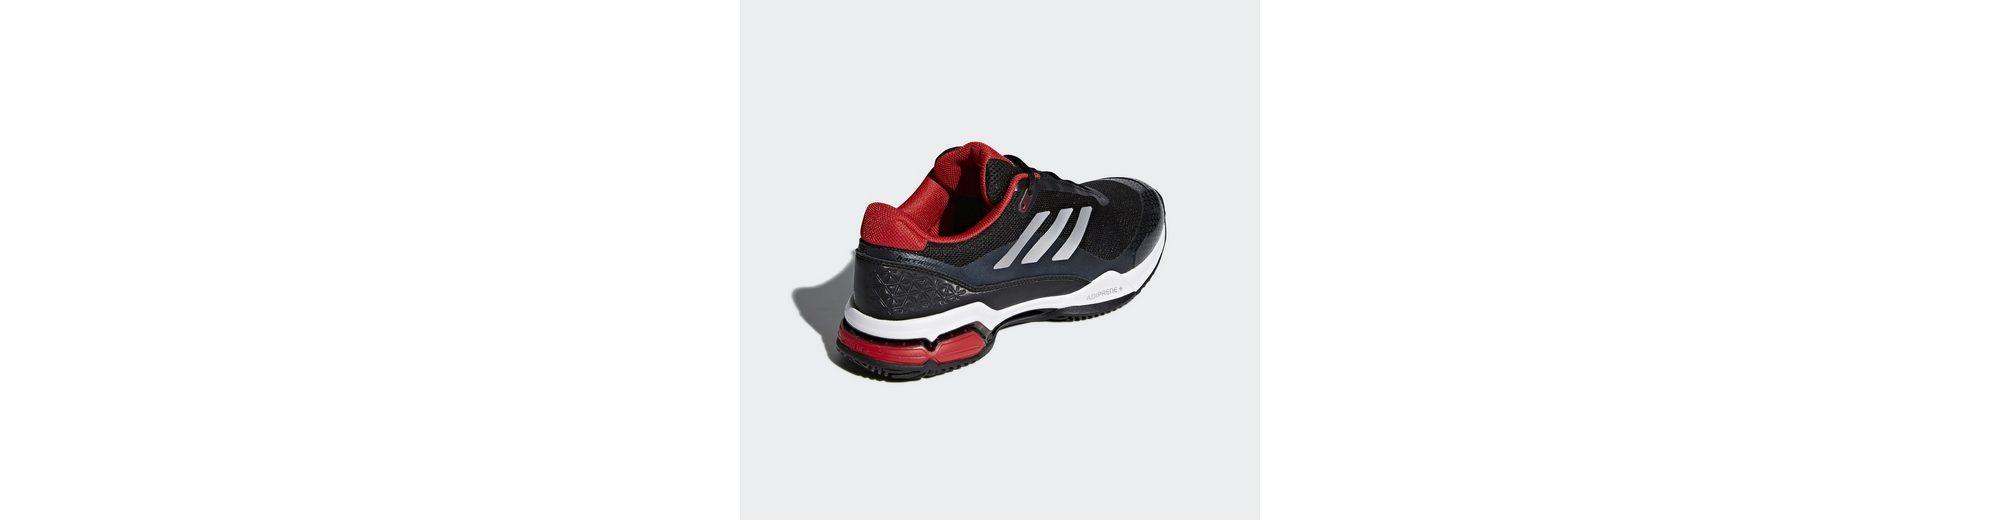 Günstige Manchester-Großer Verkauf adidas Performance Barricade Club Schuh Tennisschuh Kostengünstig JRKLE